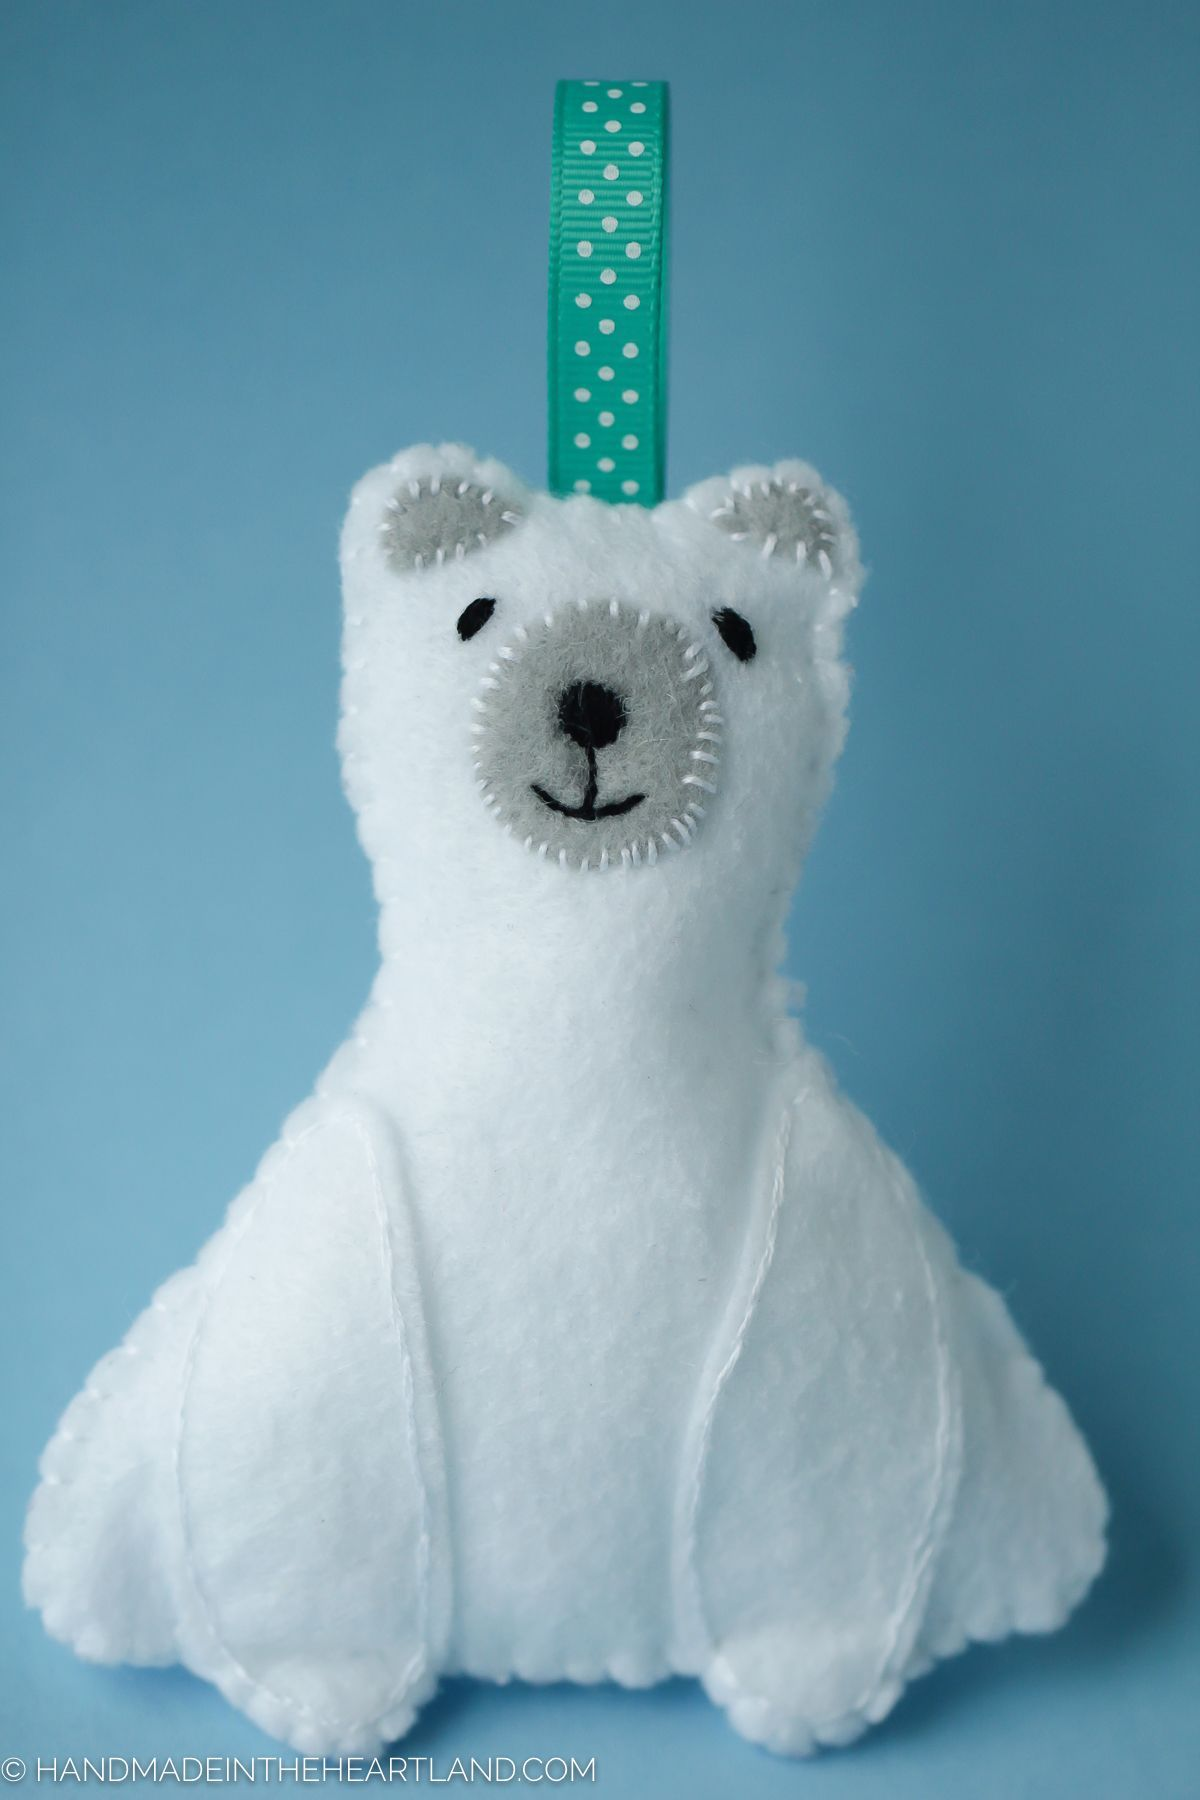 Polar Bear Felt Ornaments Diy Unique Felt Holiday Idea To Decorate You Christmas Tr Christmas Ornaments Homemade Polar Bear Ornaments Felt Christmas Ornaments